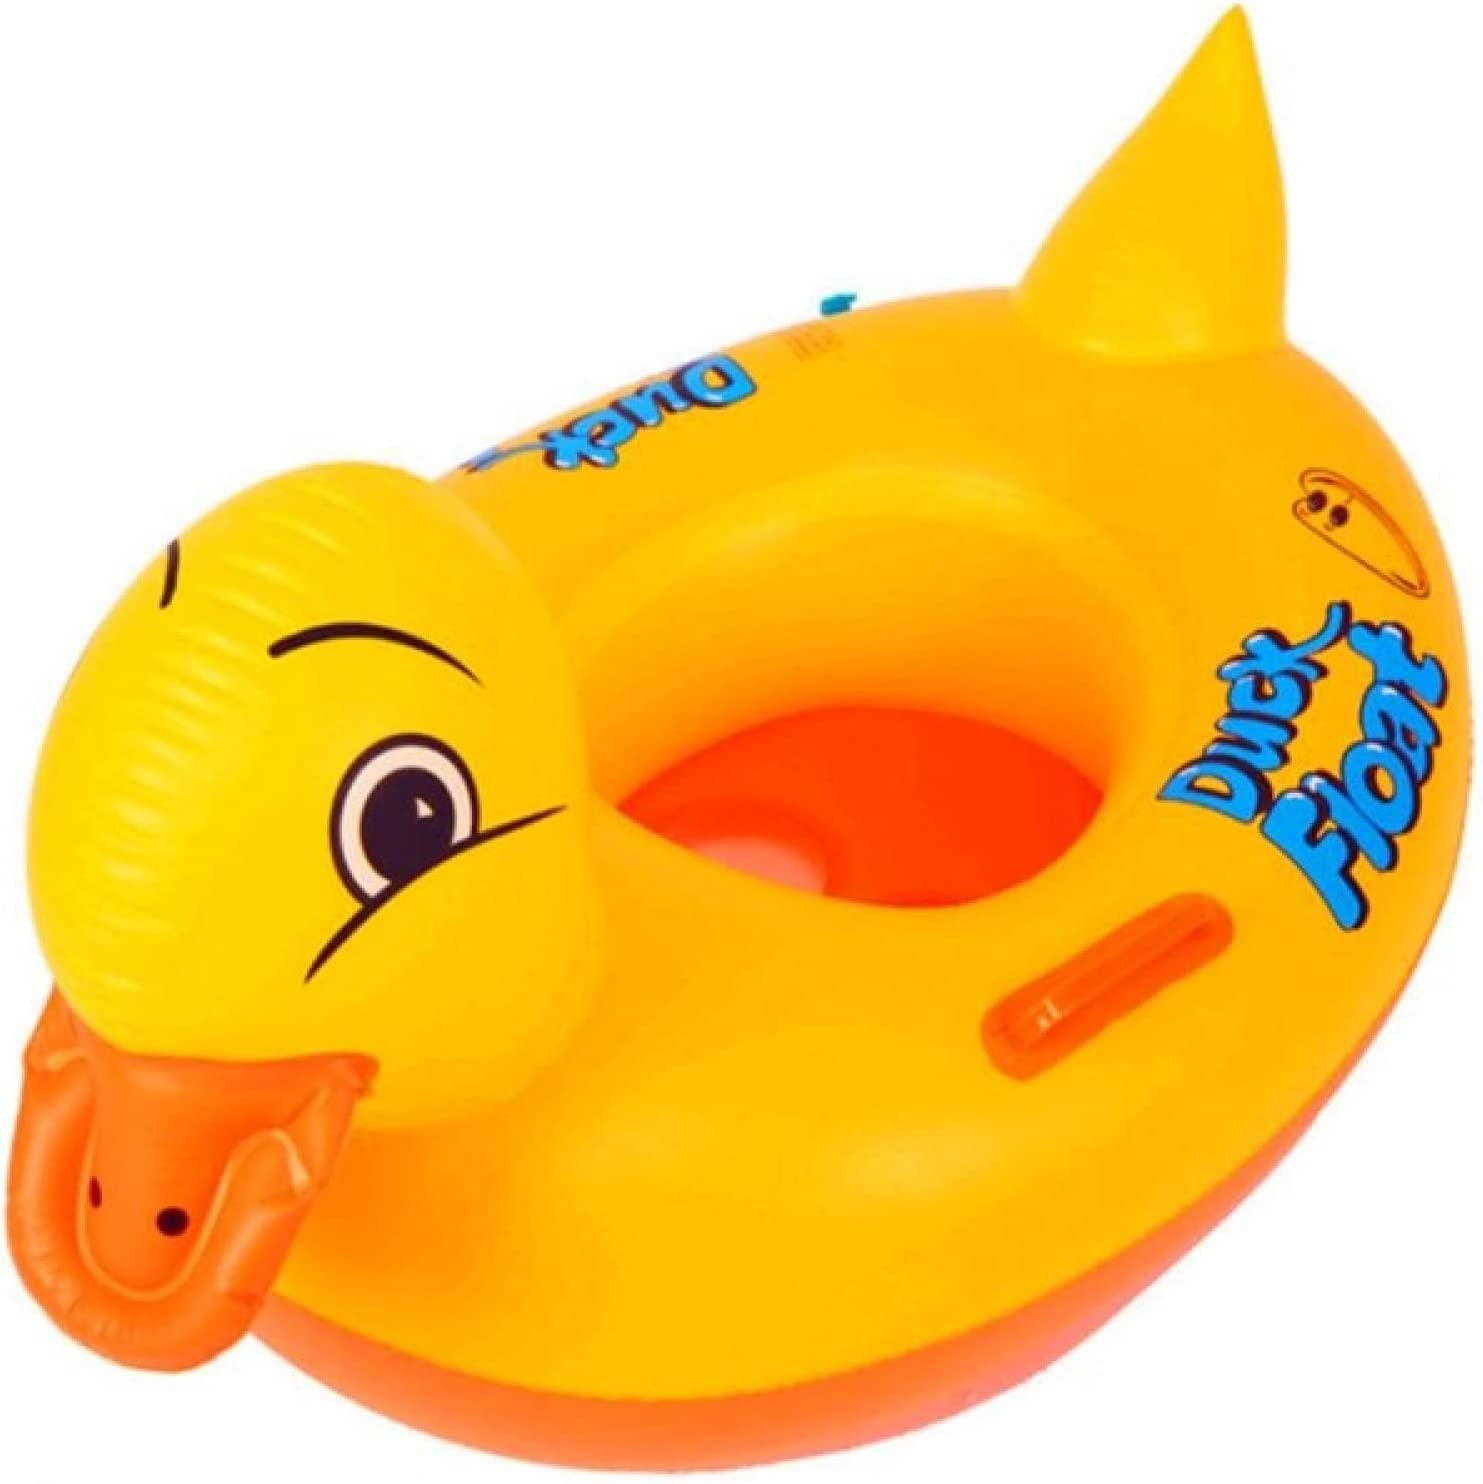 Aiong Swimming Ring Choice Shaped Gloat Inflatable Sa Soldering Baby Toddler Kids